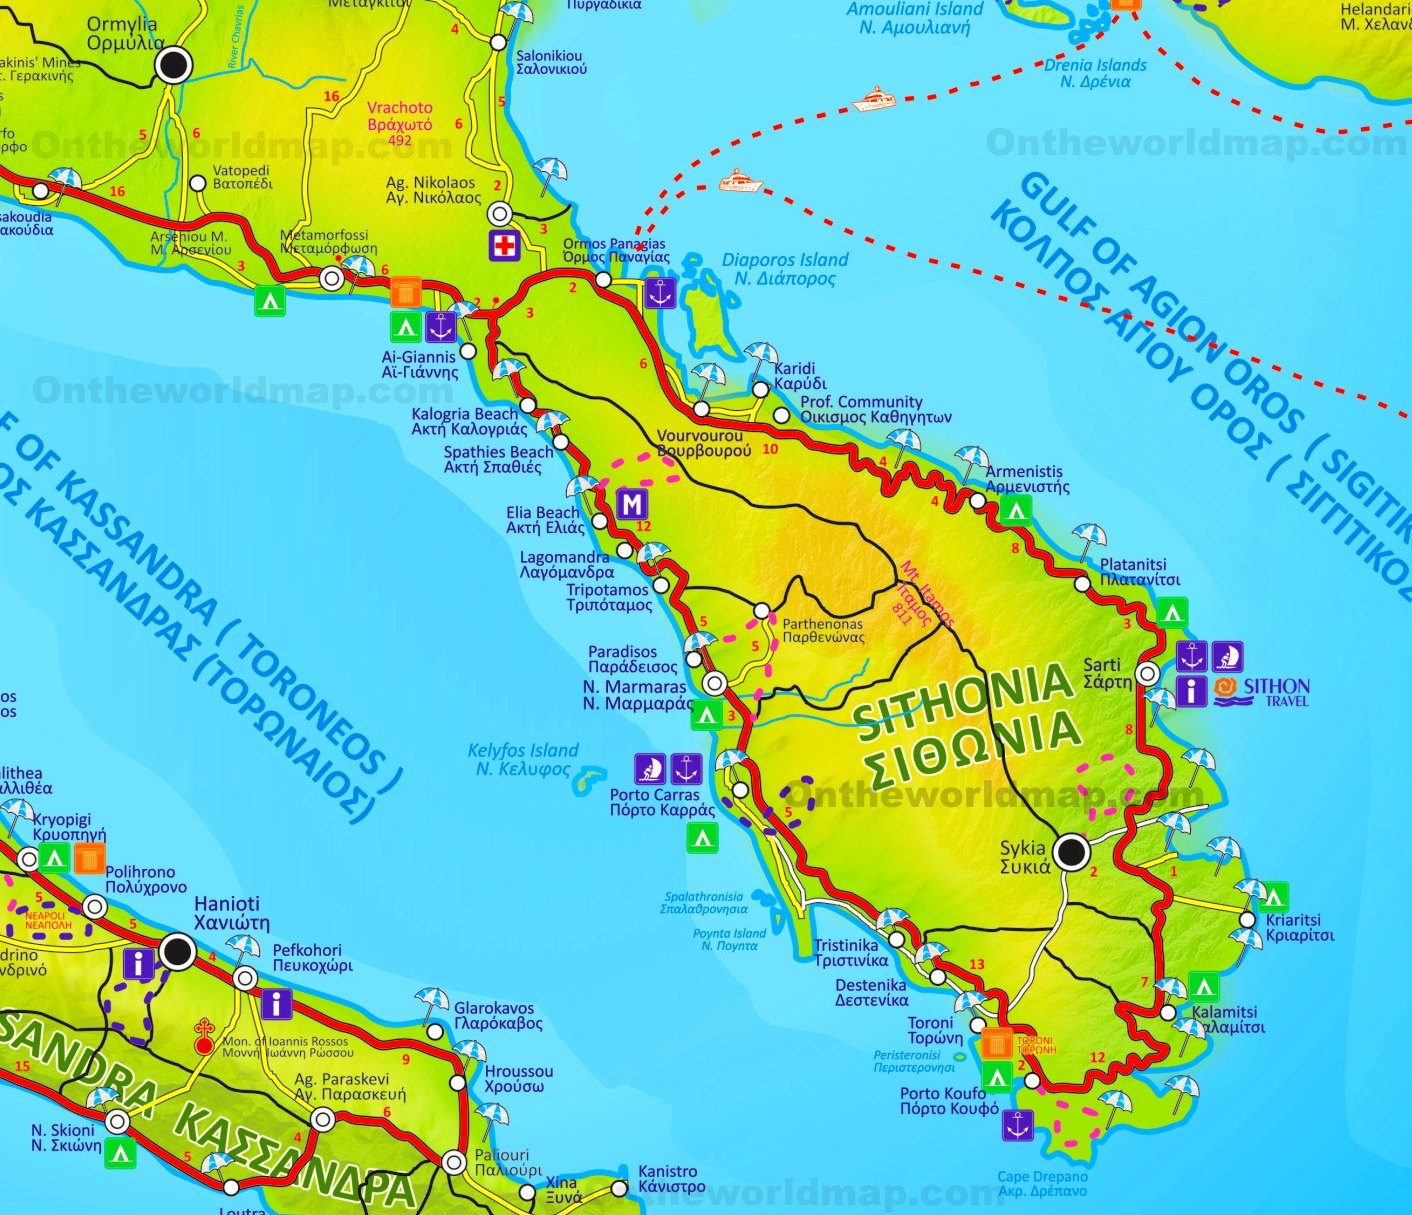 Sithonia Maps Greece Maps of Sithonia